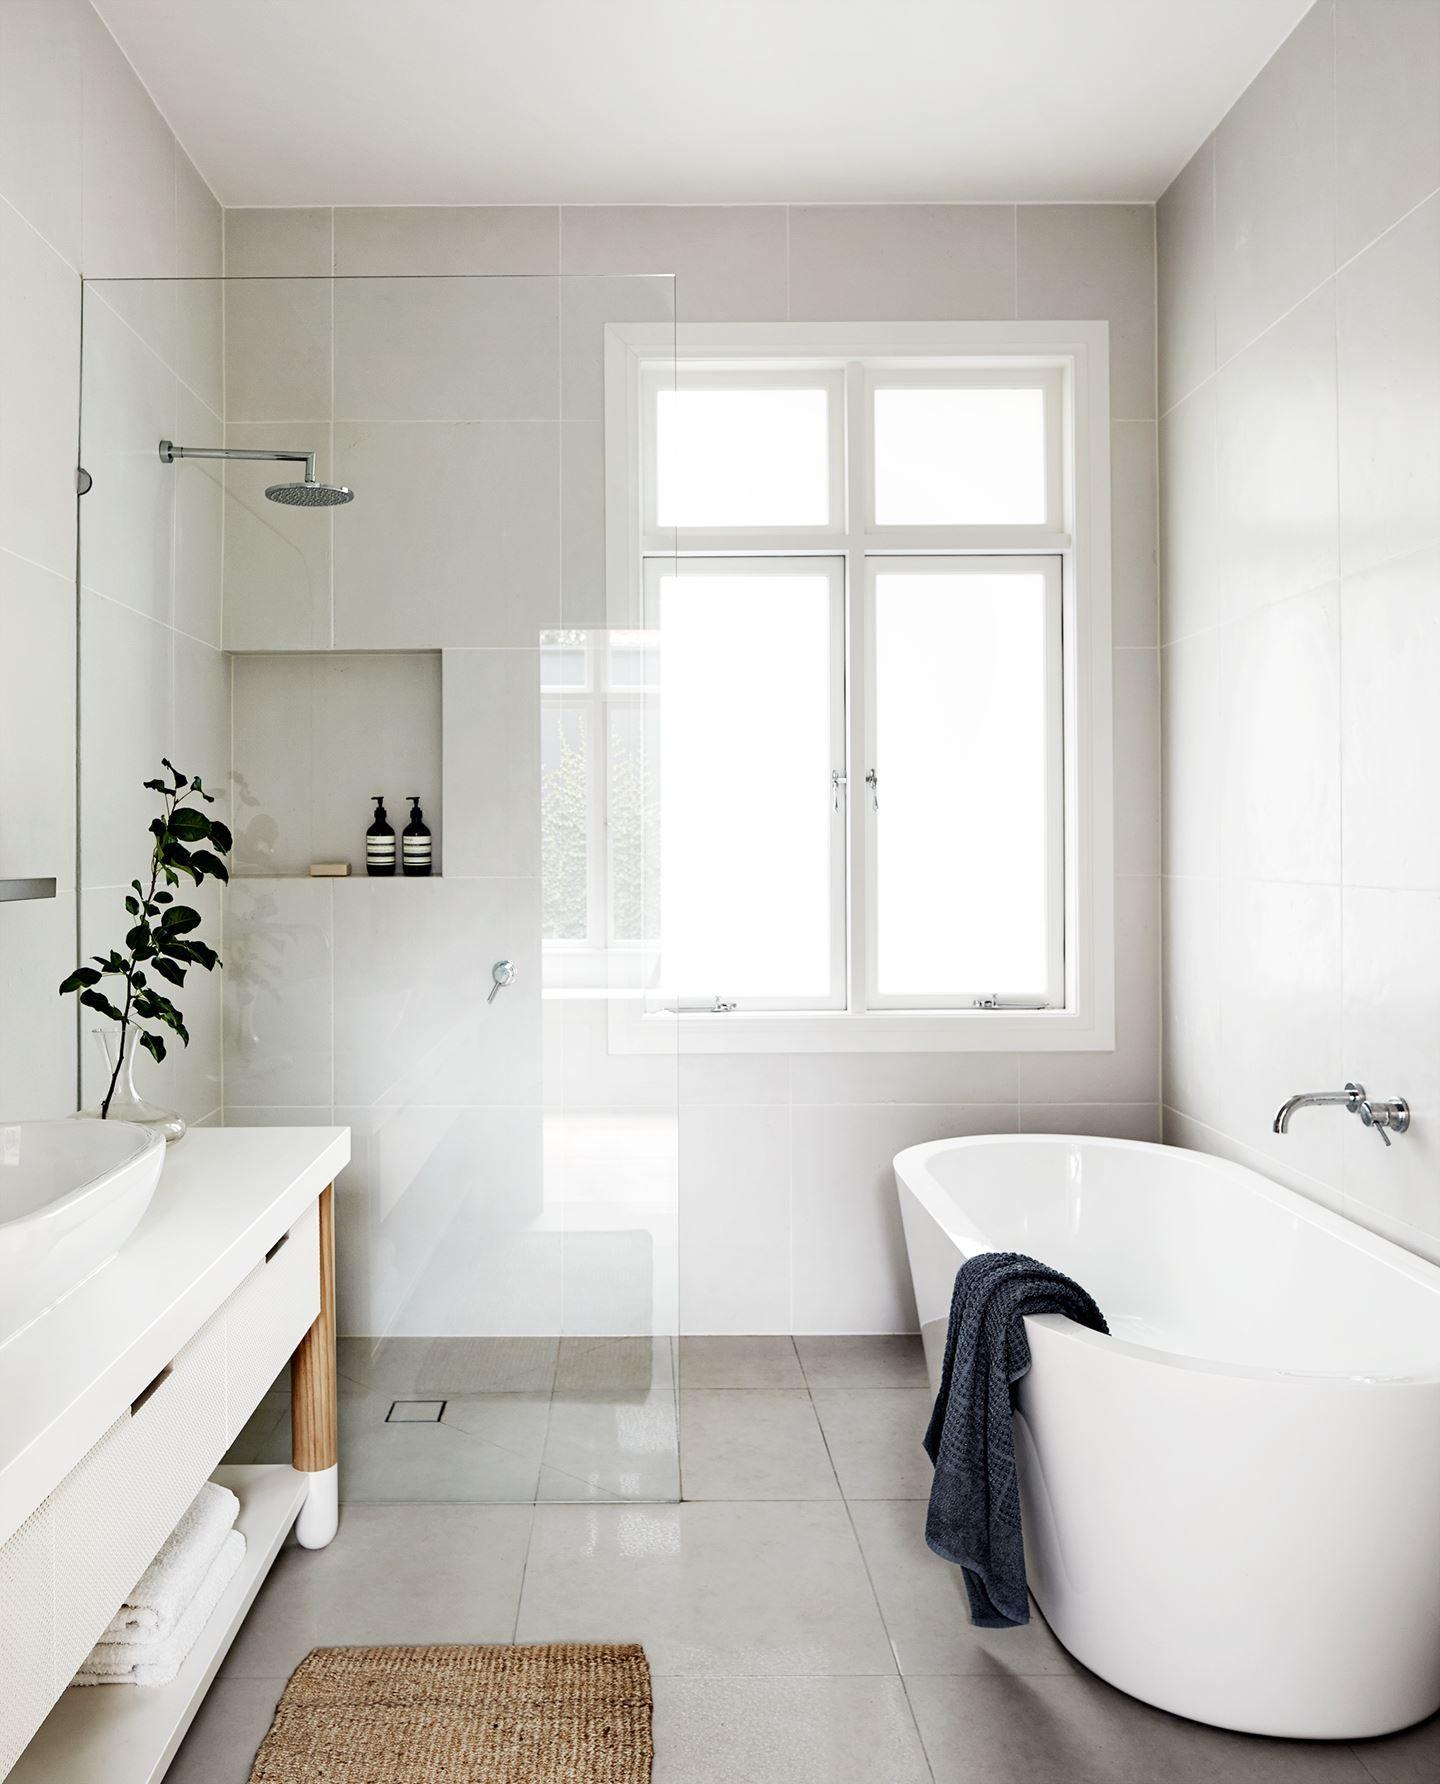 Luxury Bathrooms that are Instant Classics | Family bathroom ...